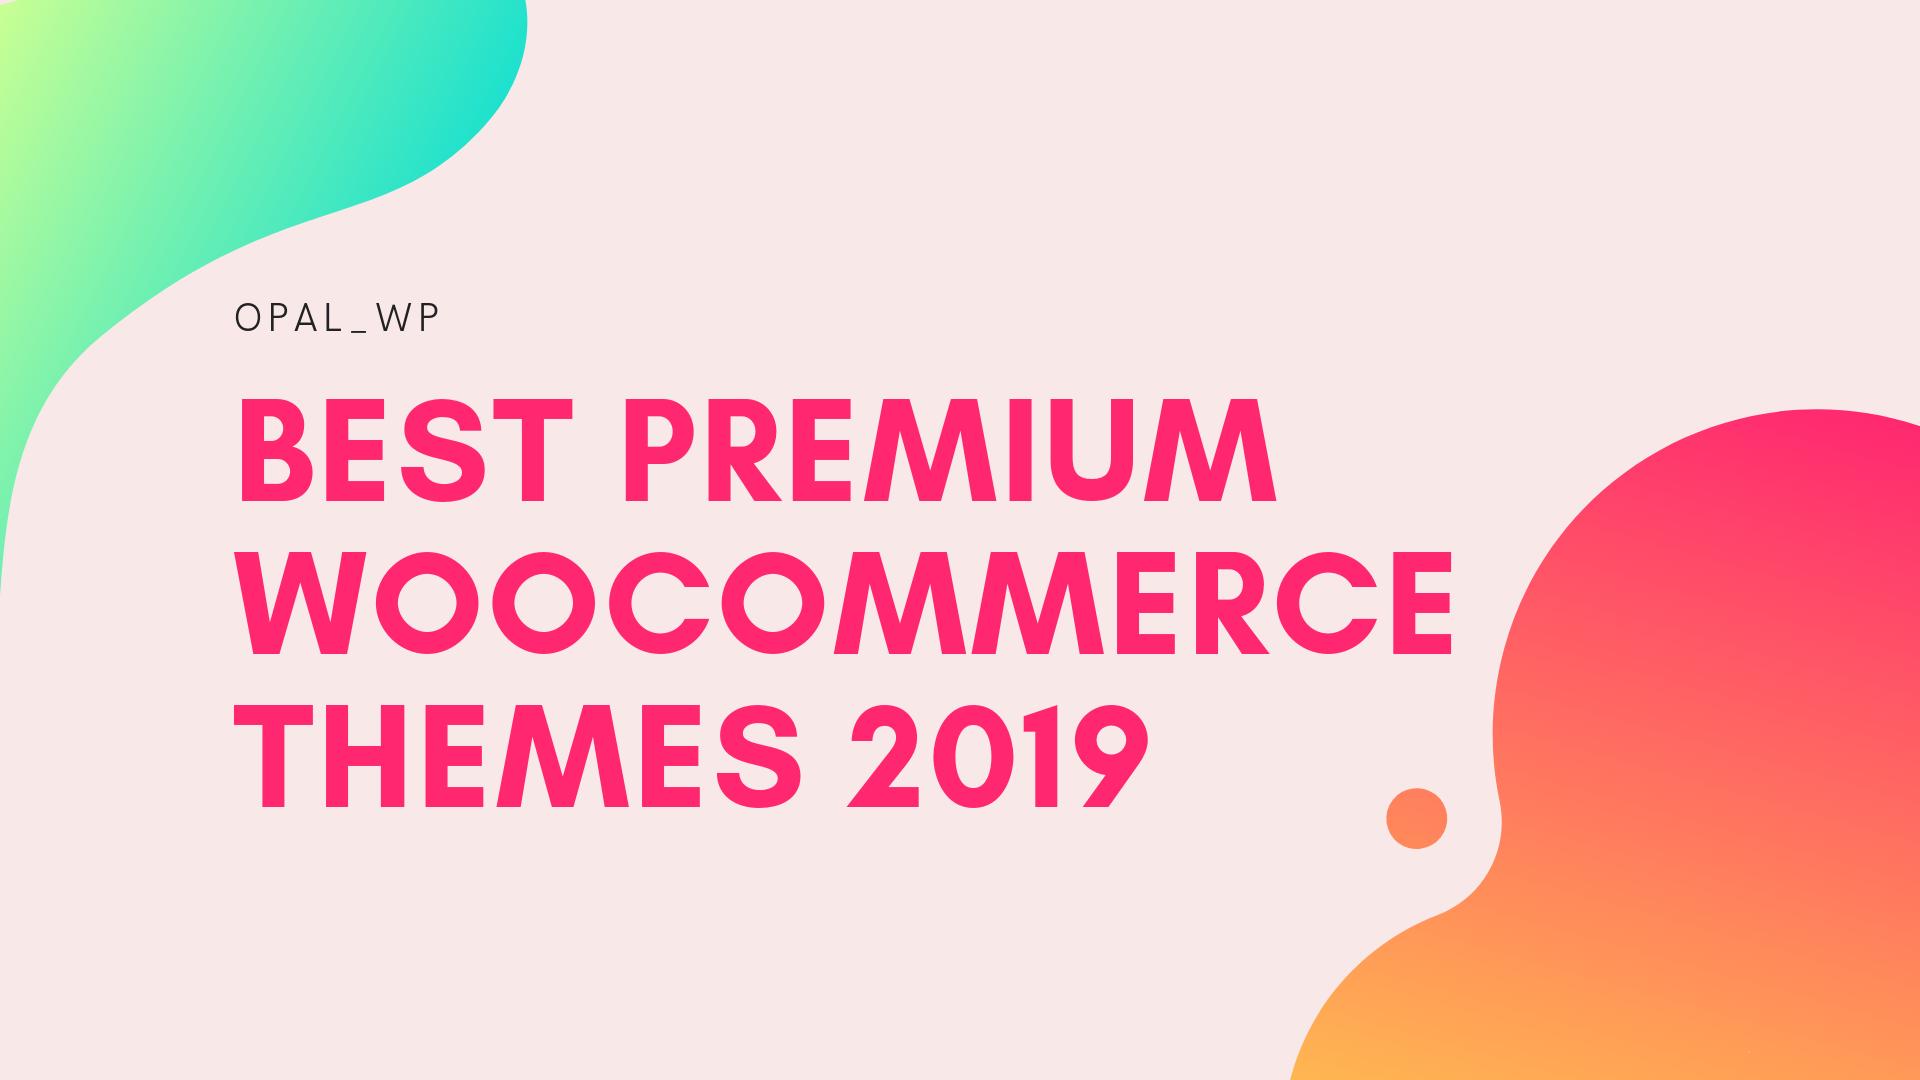 Best premium woocommerce themes 2019